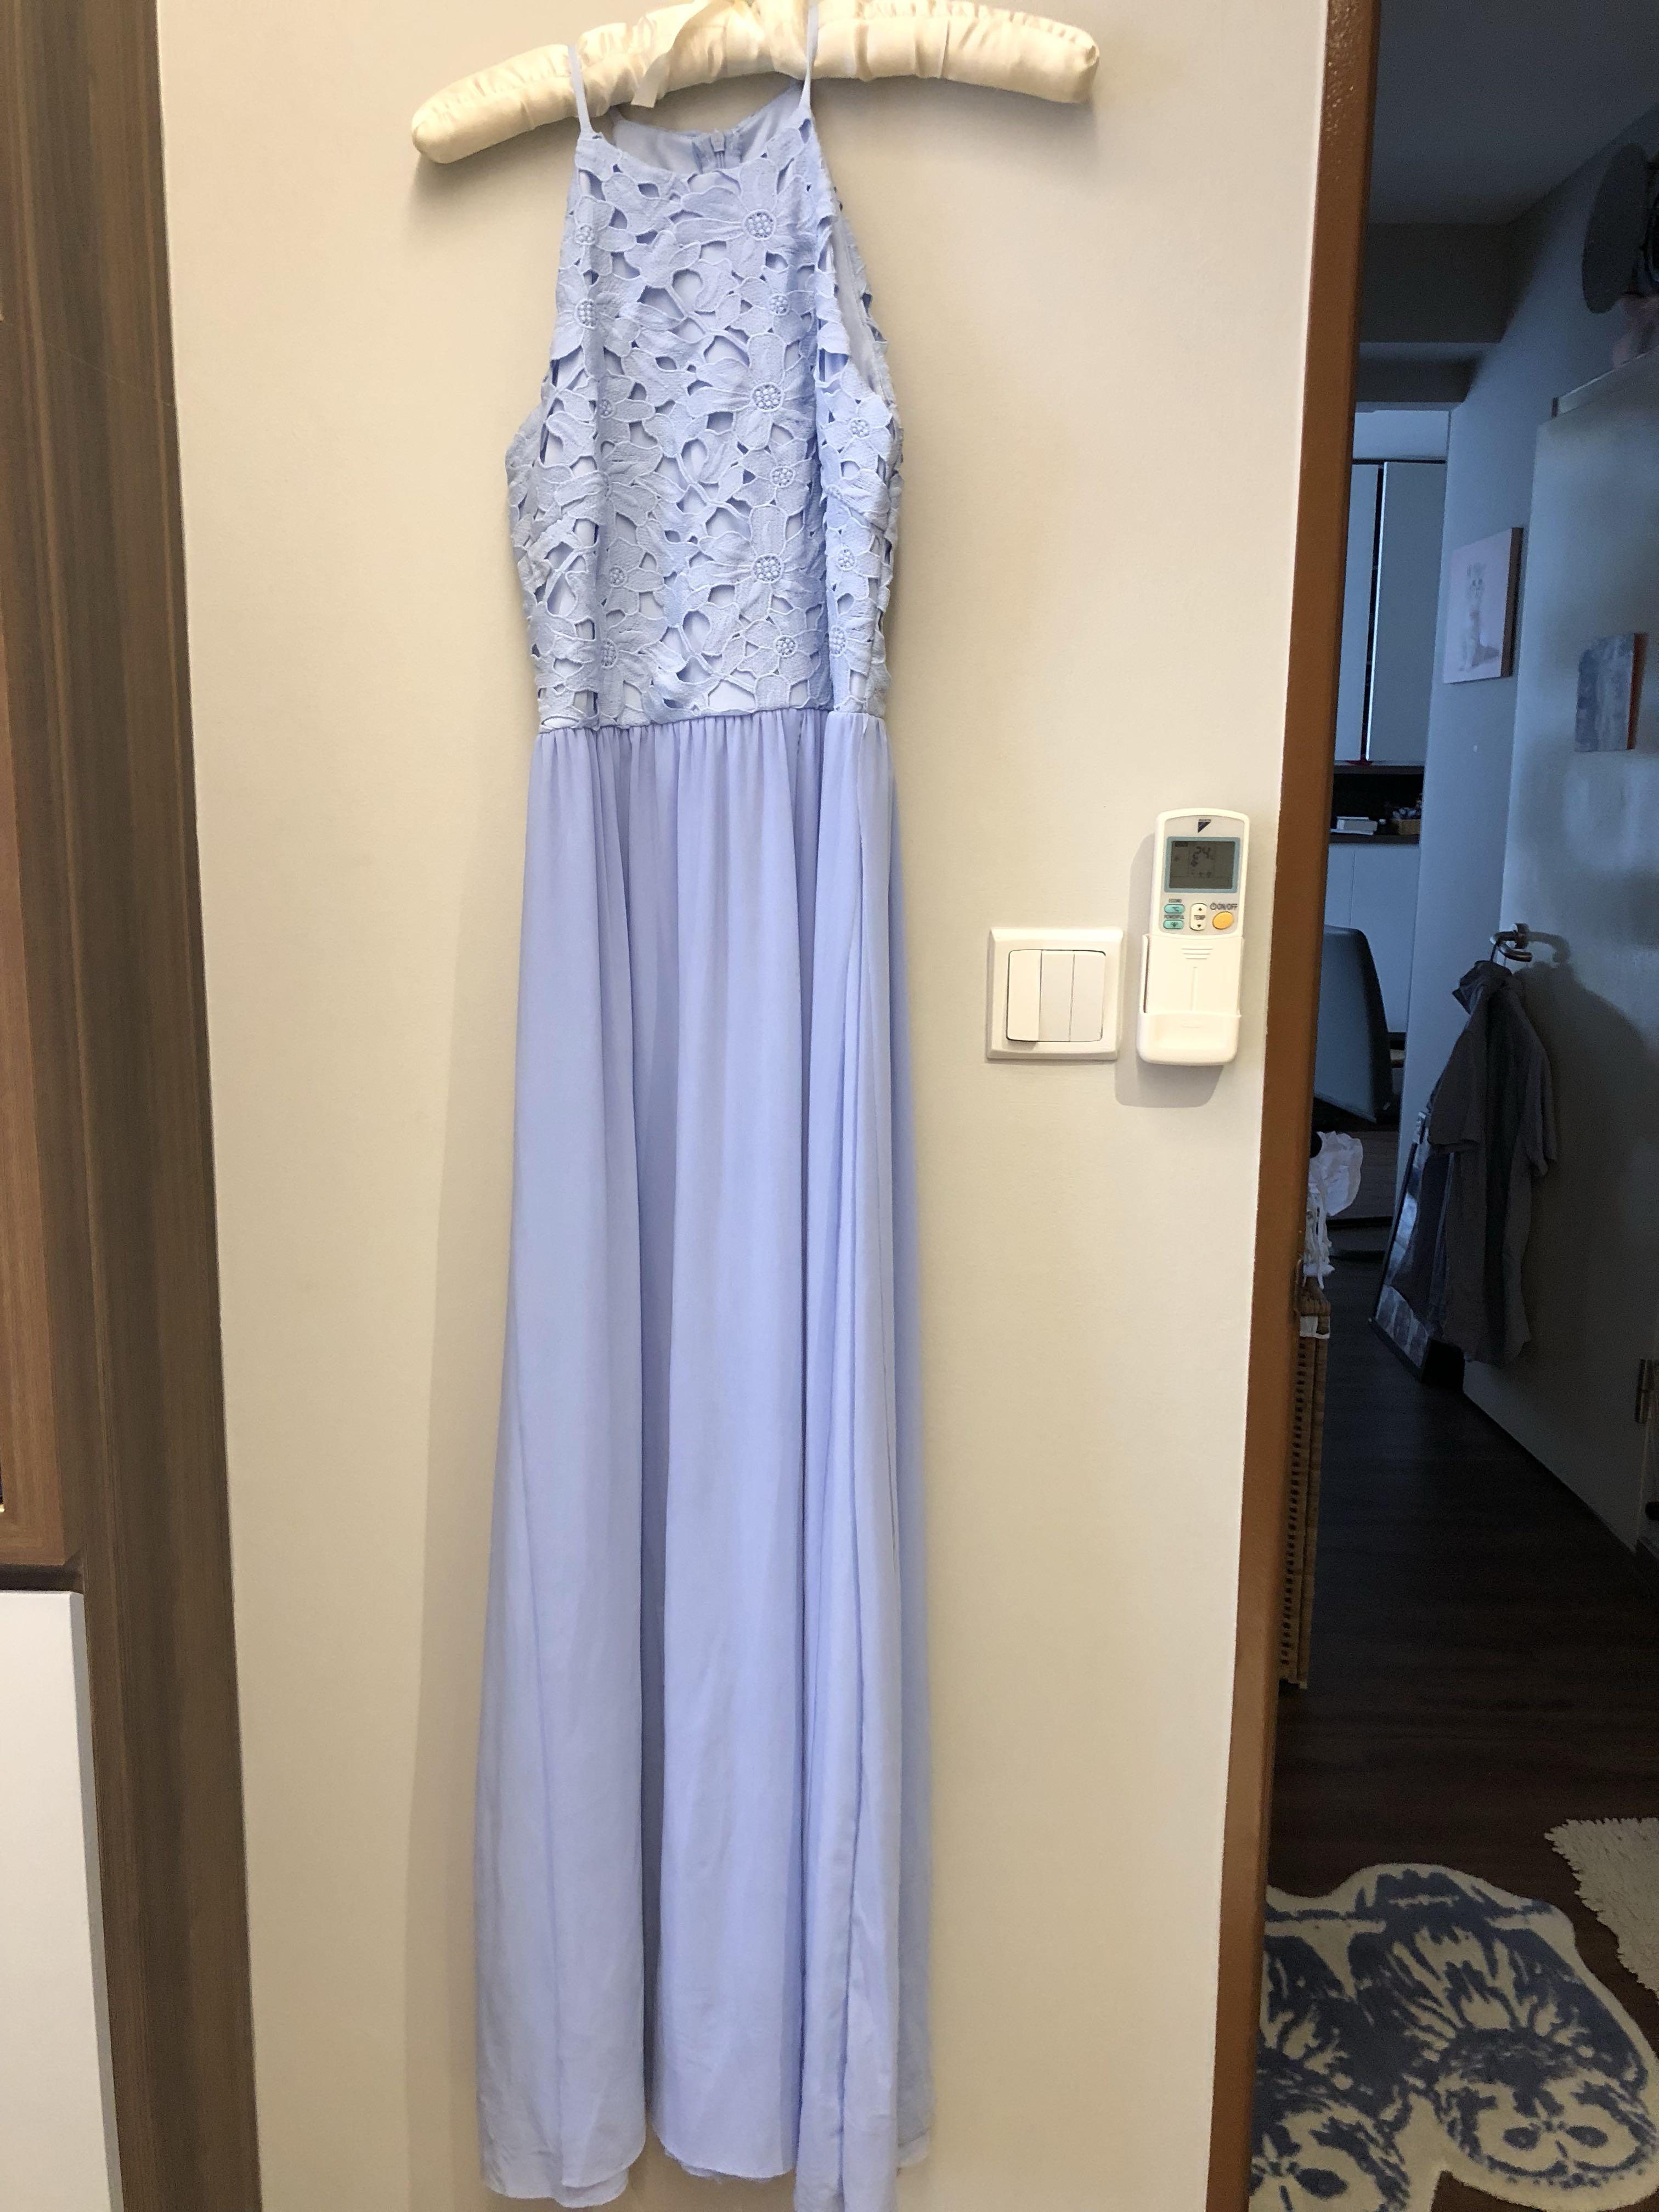 e2991273a240 Thread theory maxi dress, Women's Fashion, Clothes, Dresses & Skirts ...